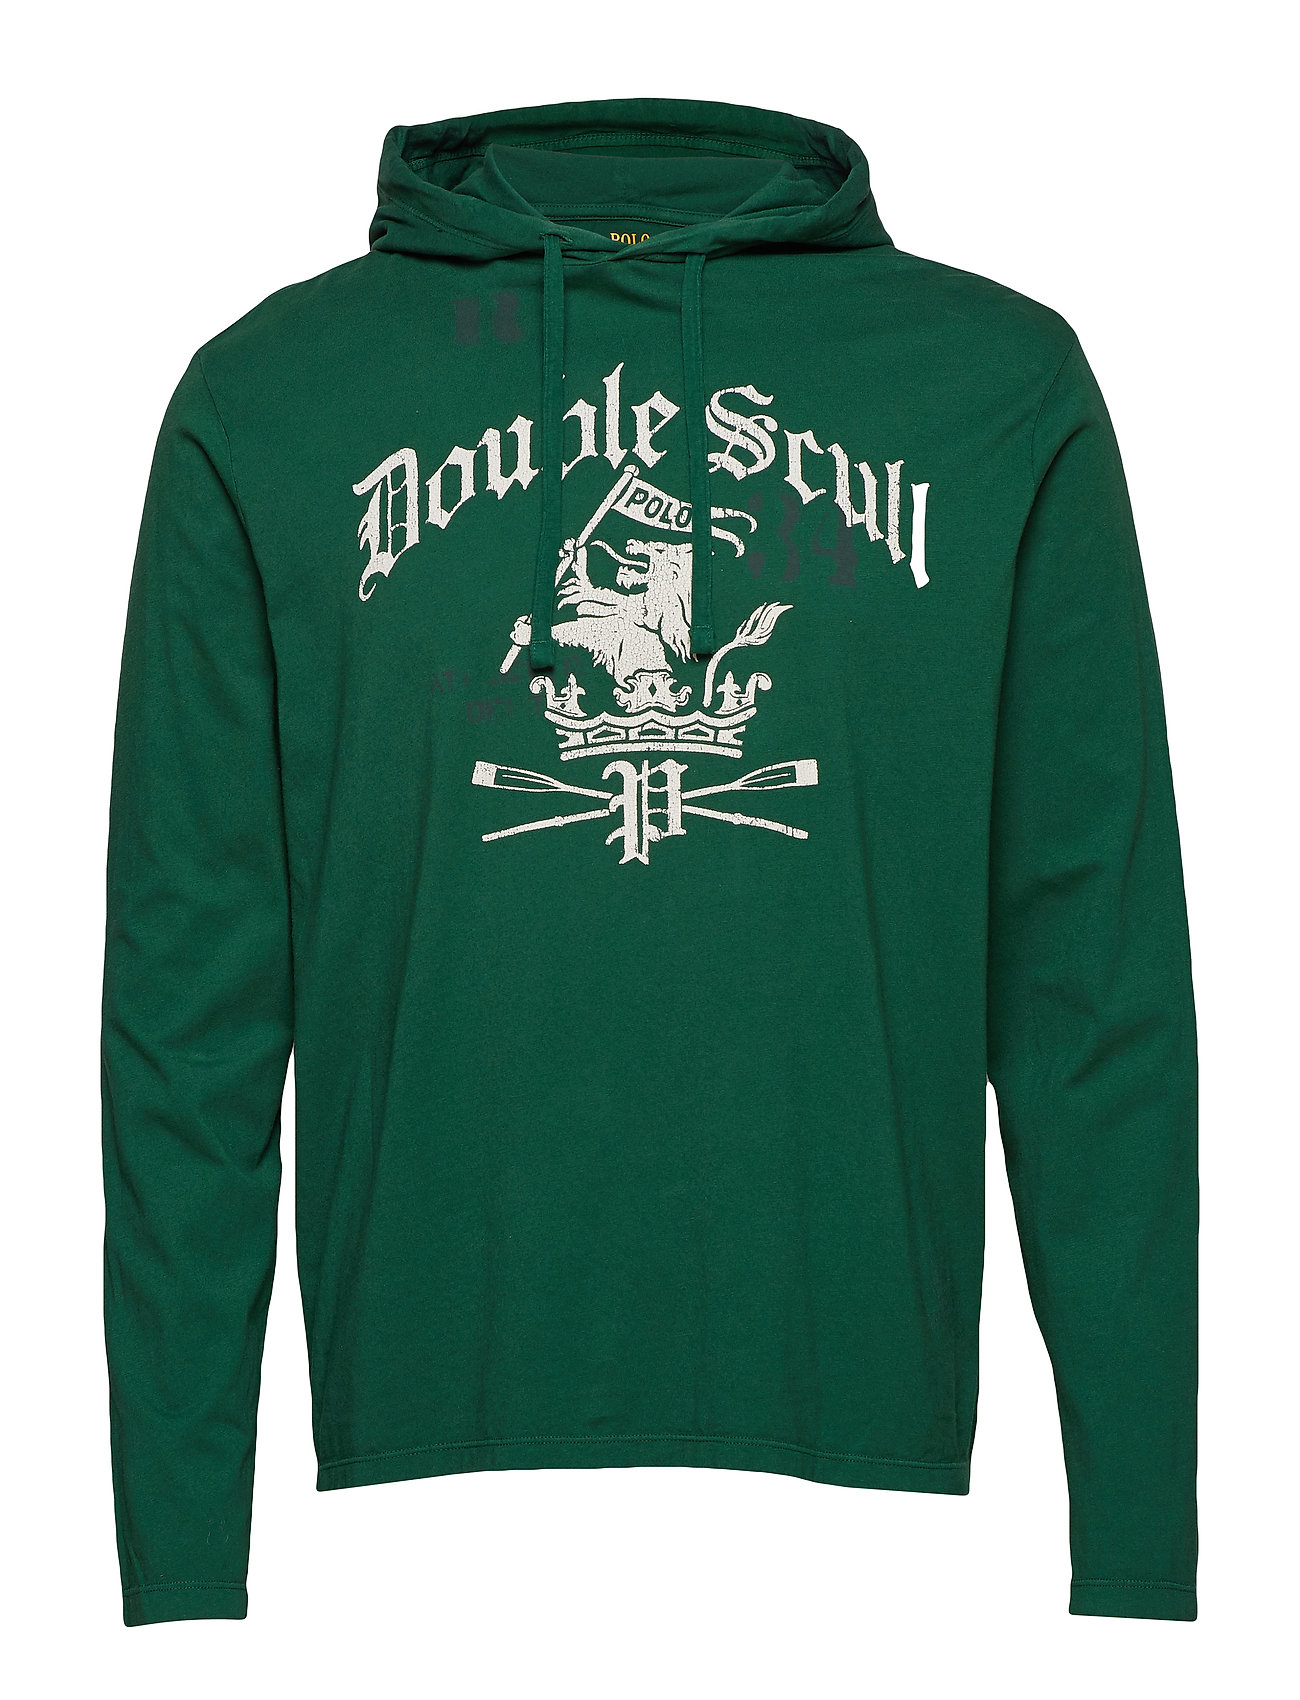 f4770544061 Cotton Jersey Hooded T-shirt (New Forest) (£75) - Polo Ralph Lauren ...